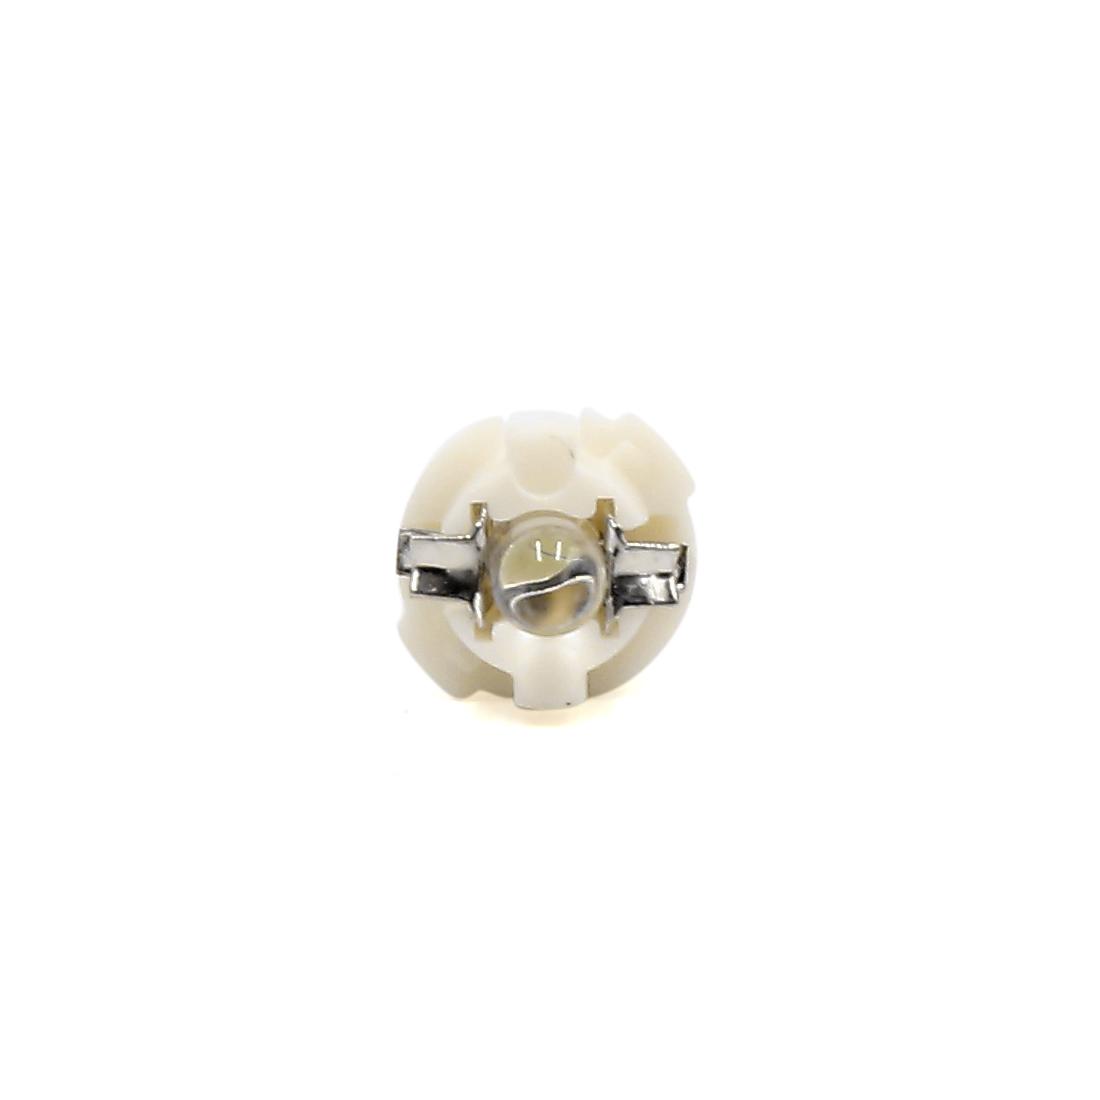 20pcs White LED 12V B8.3 Car Dashboard Instrument Gauge Panel Light Bulb - image 1 de 4